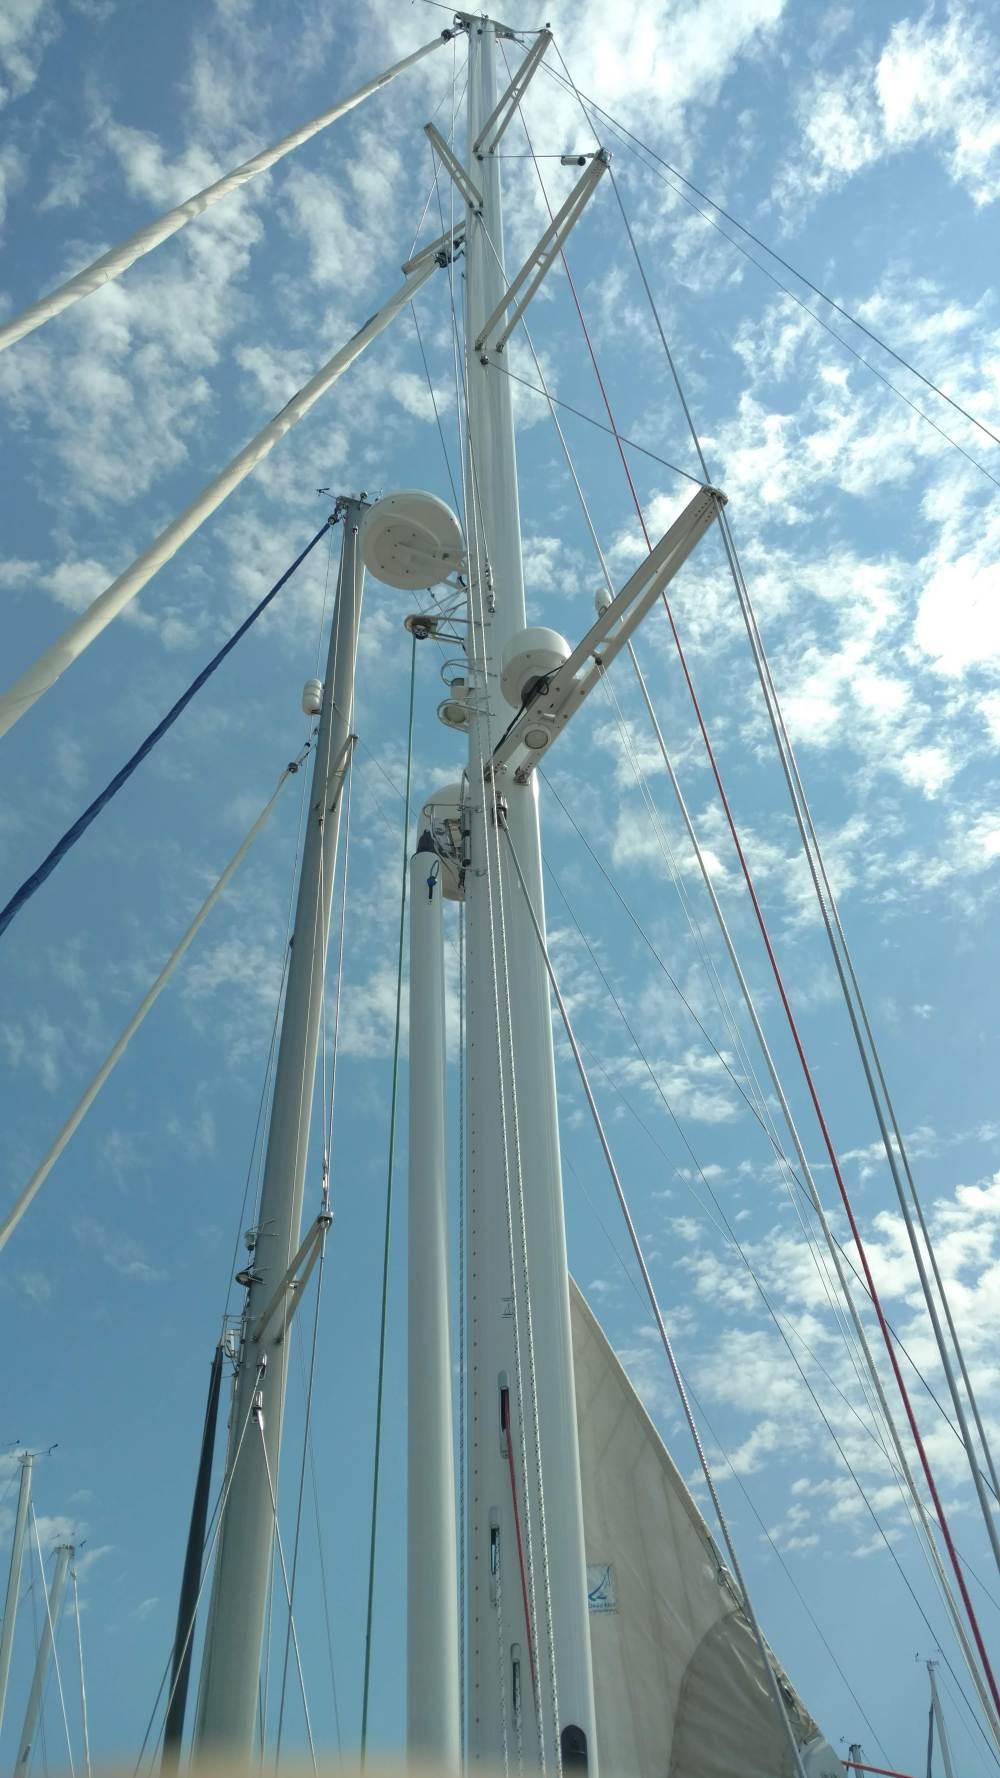 Sailing Systems Check Moody 54 Sailing Systems Tutorial. Sea Trials